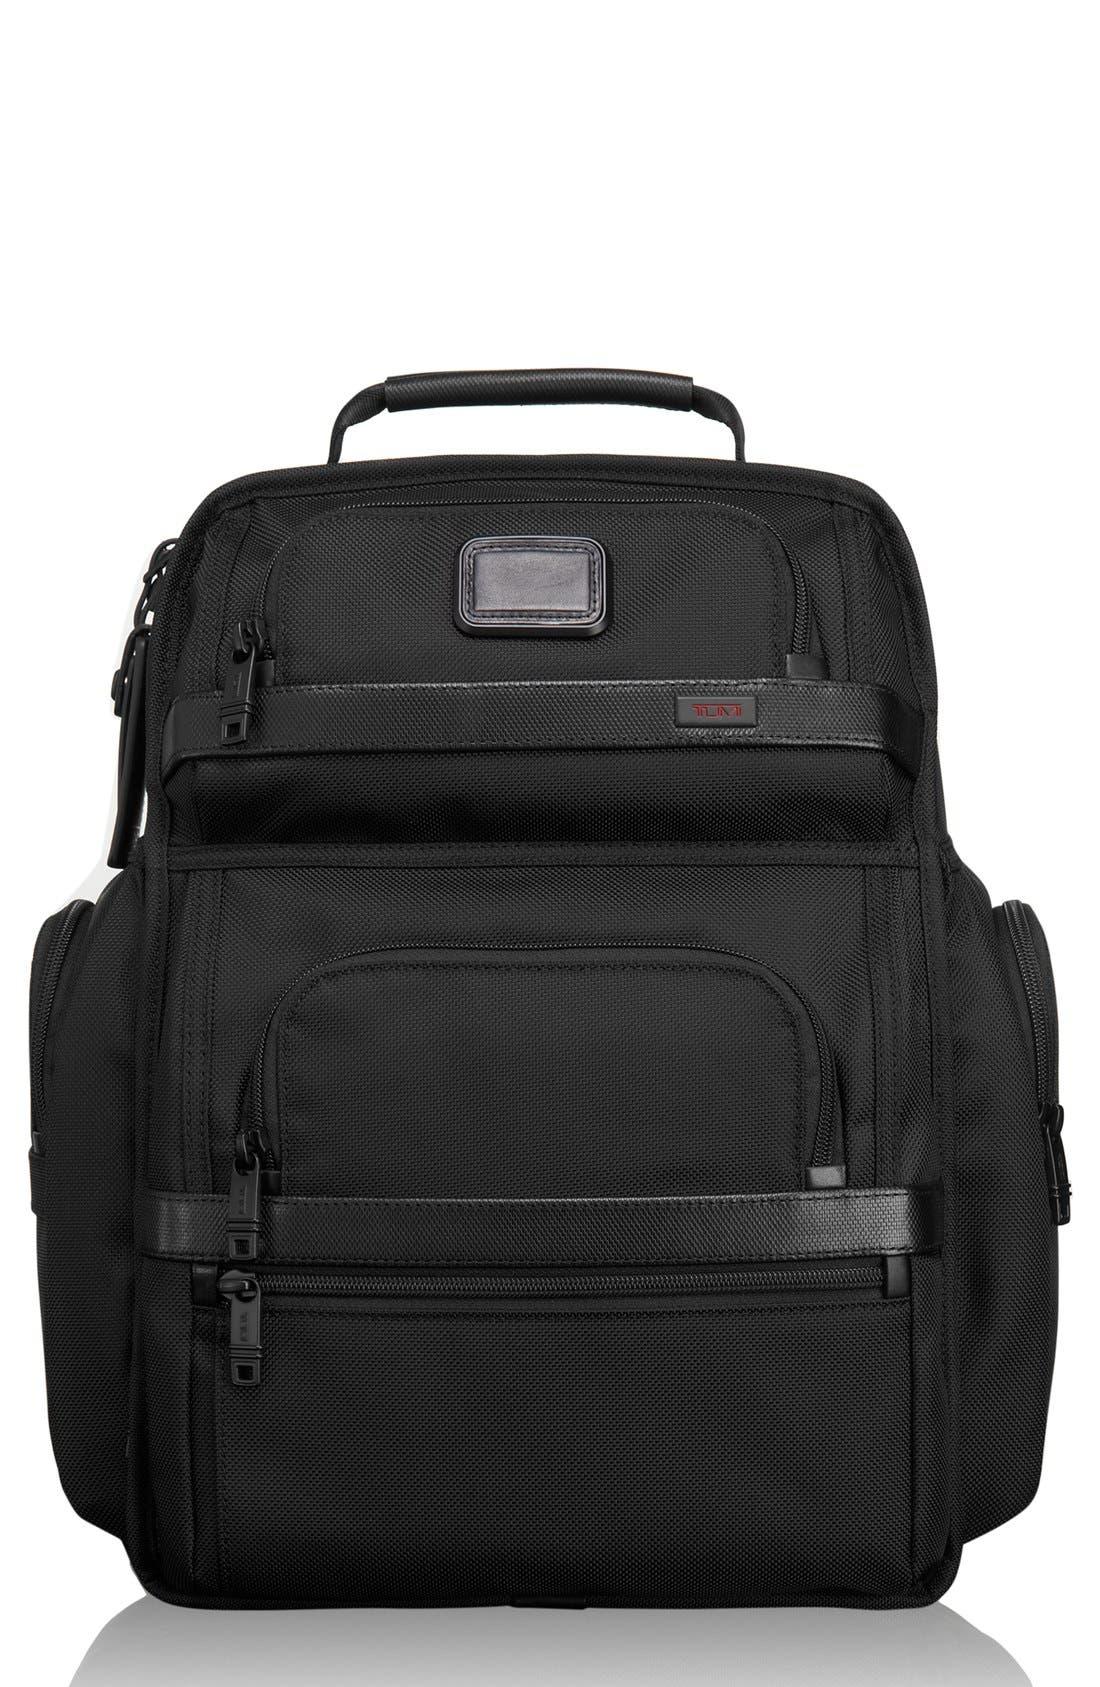 TUMI Alpha 2 T-Pass Laptop Brief Pack with Tumi ID Lock Pocket